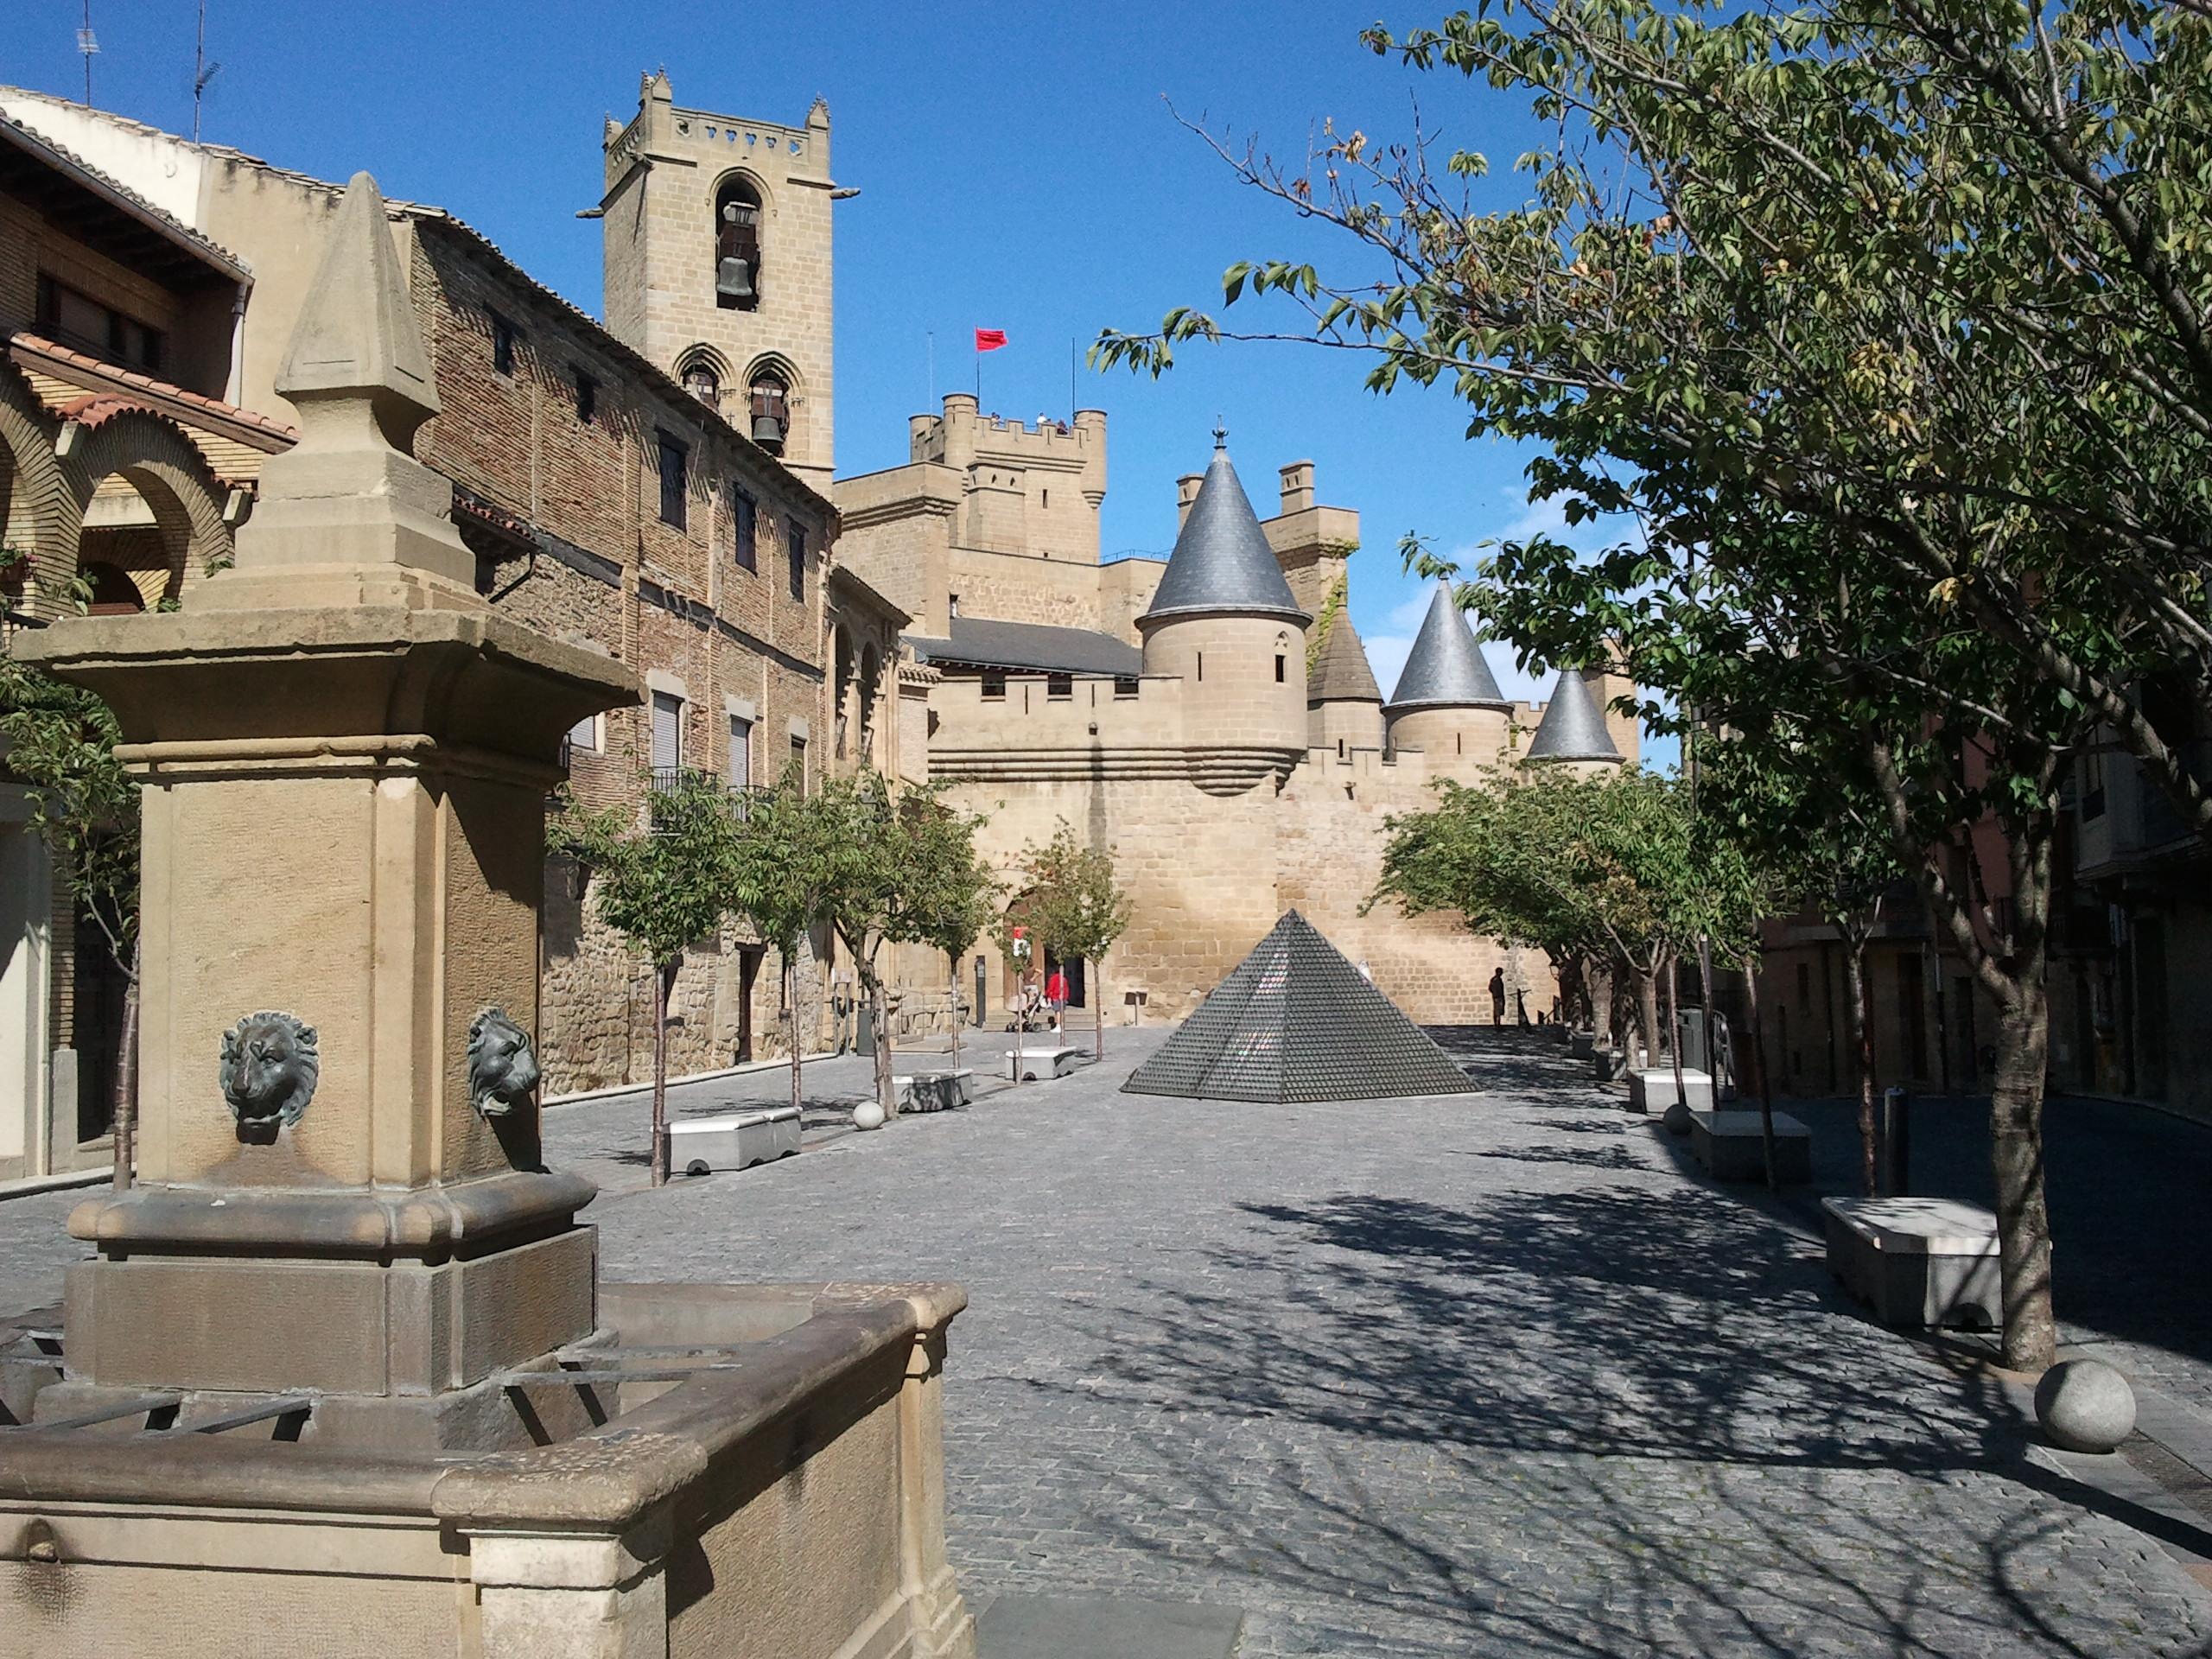 File:Olite, Navarra (España).jpg - Wikimedia Commons